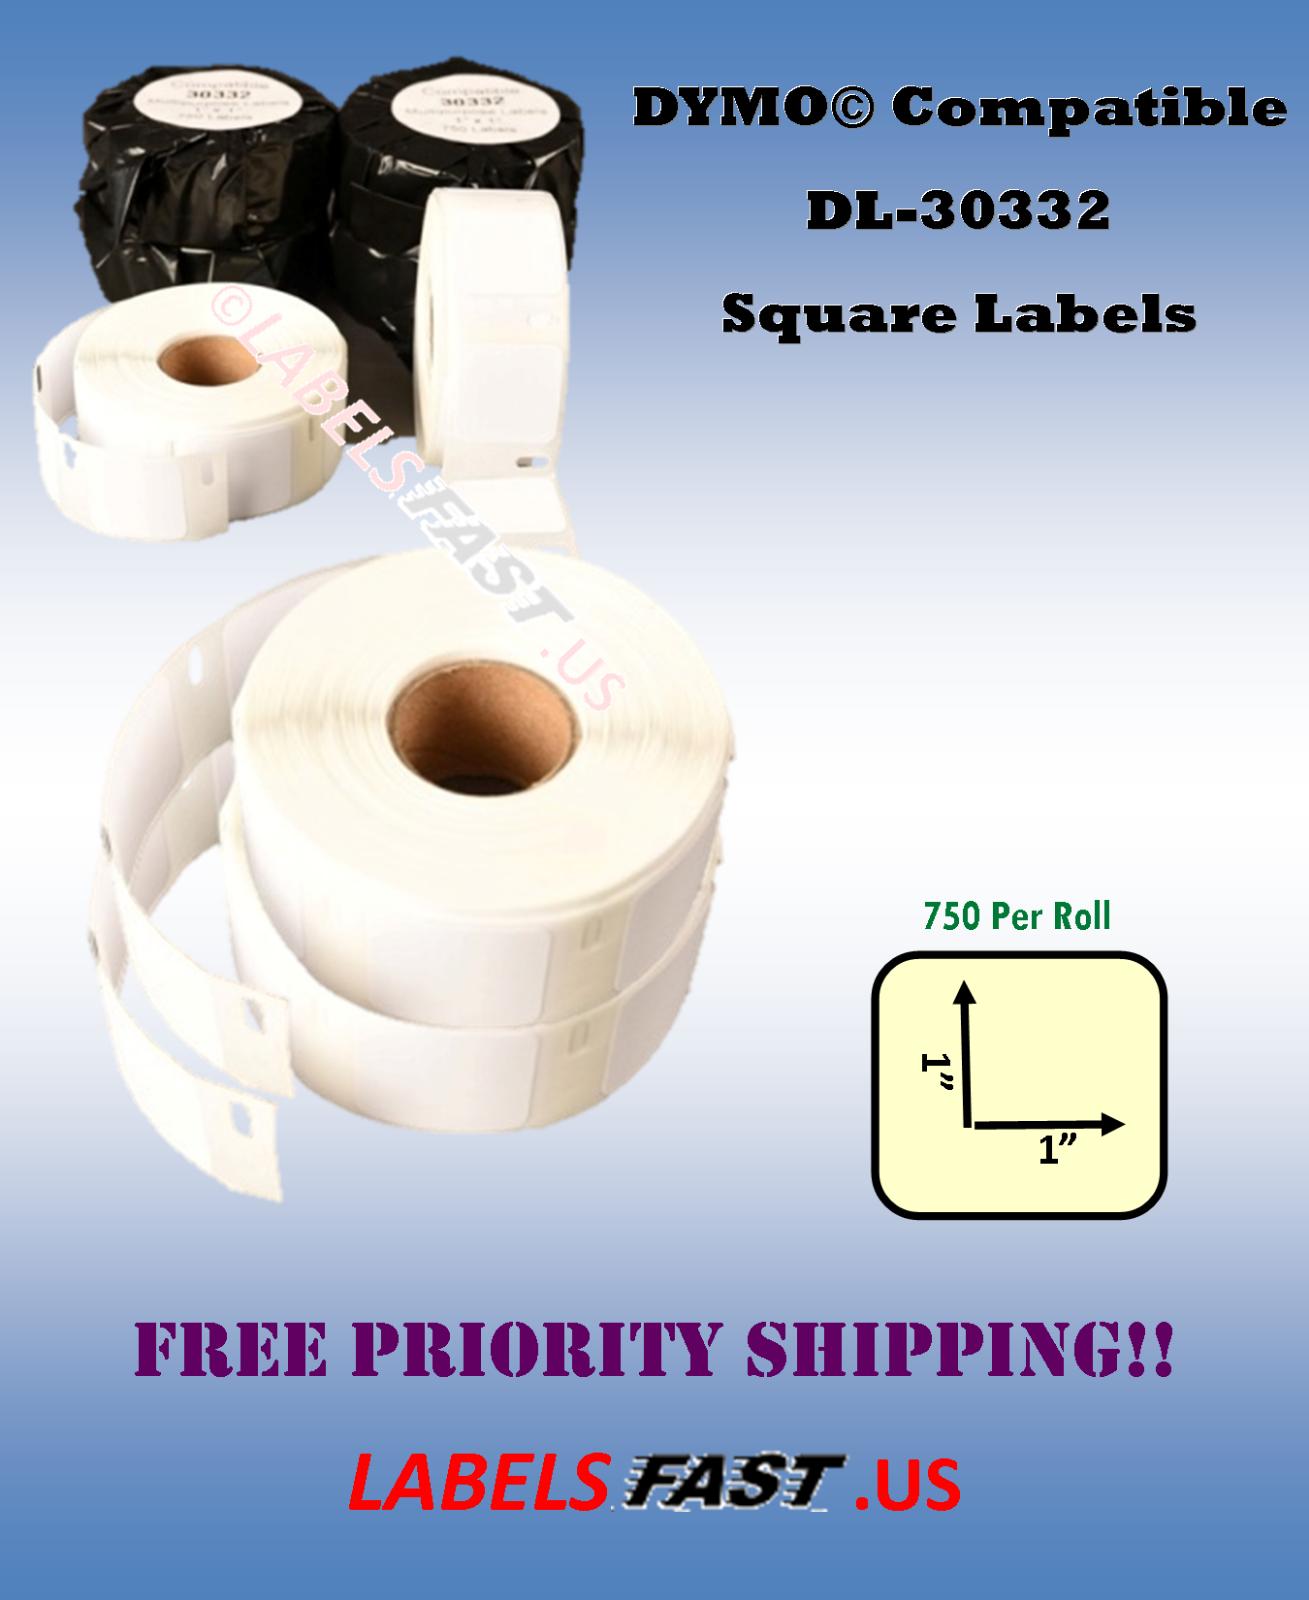 30321 Labels Dymo® LabelWriters CoStar 315 330 400 450 Twin Turbo EL40 12 Rolls